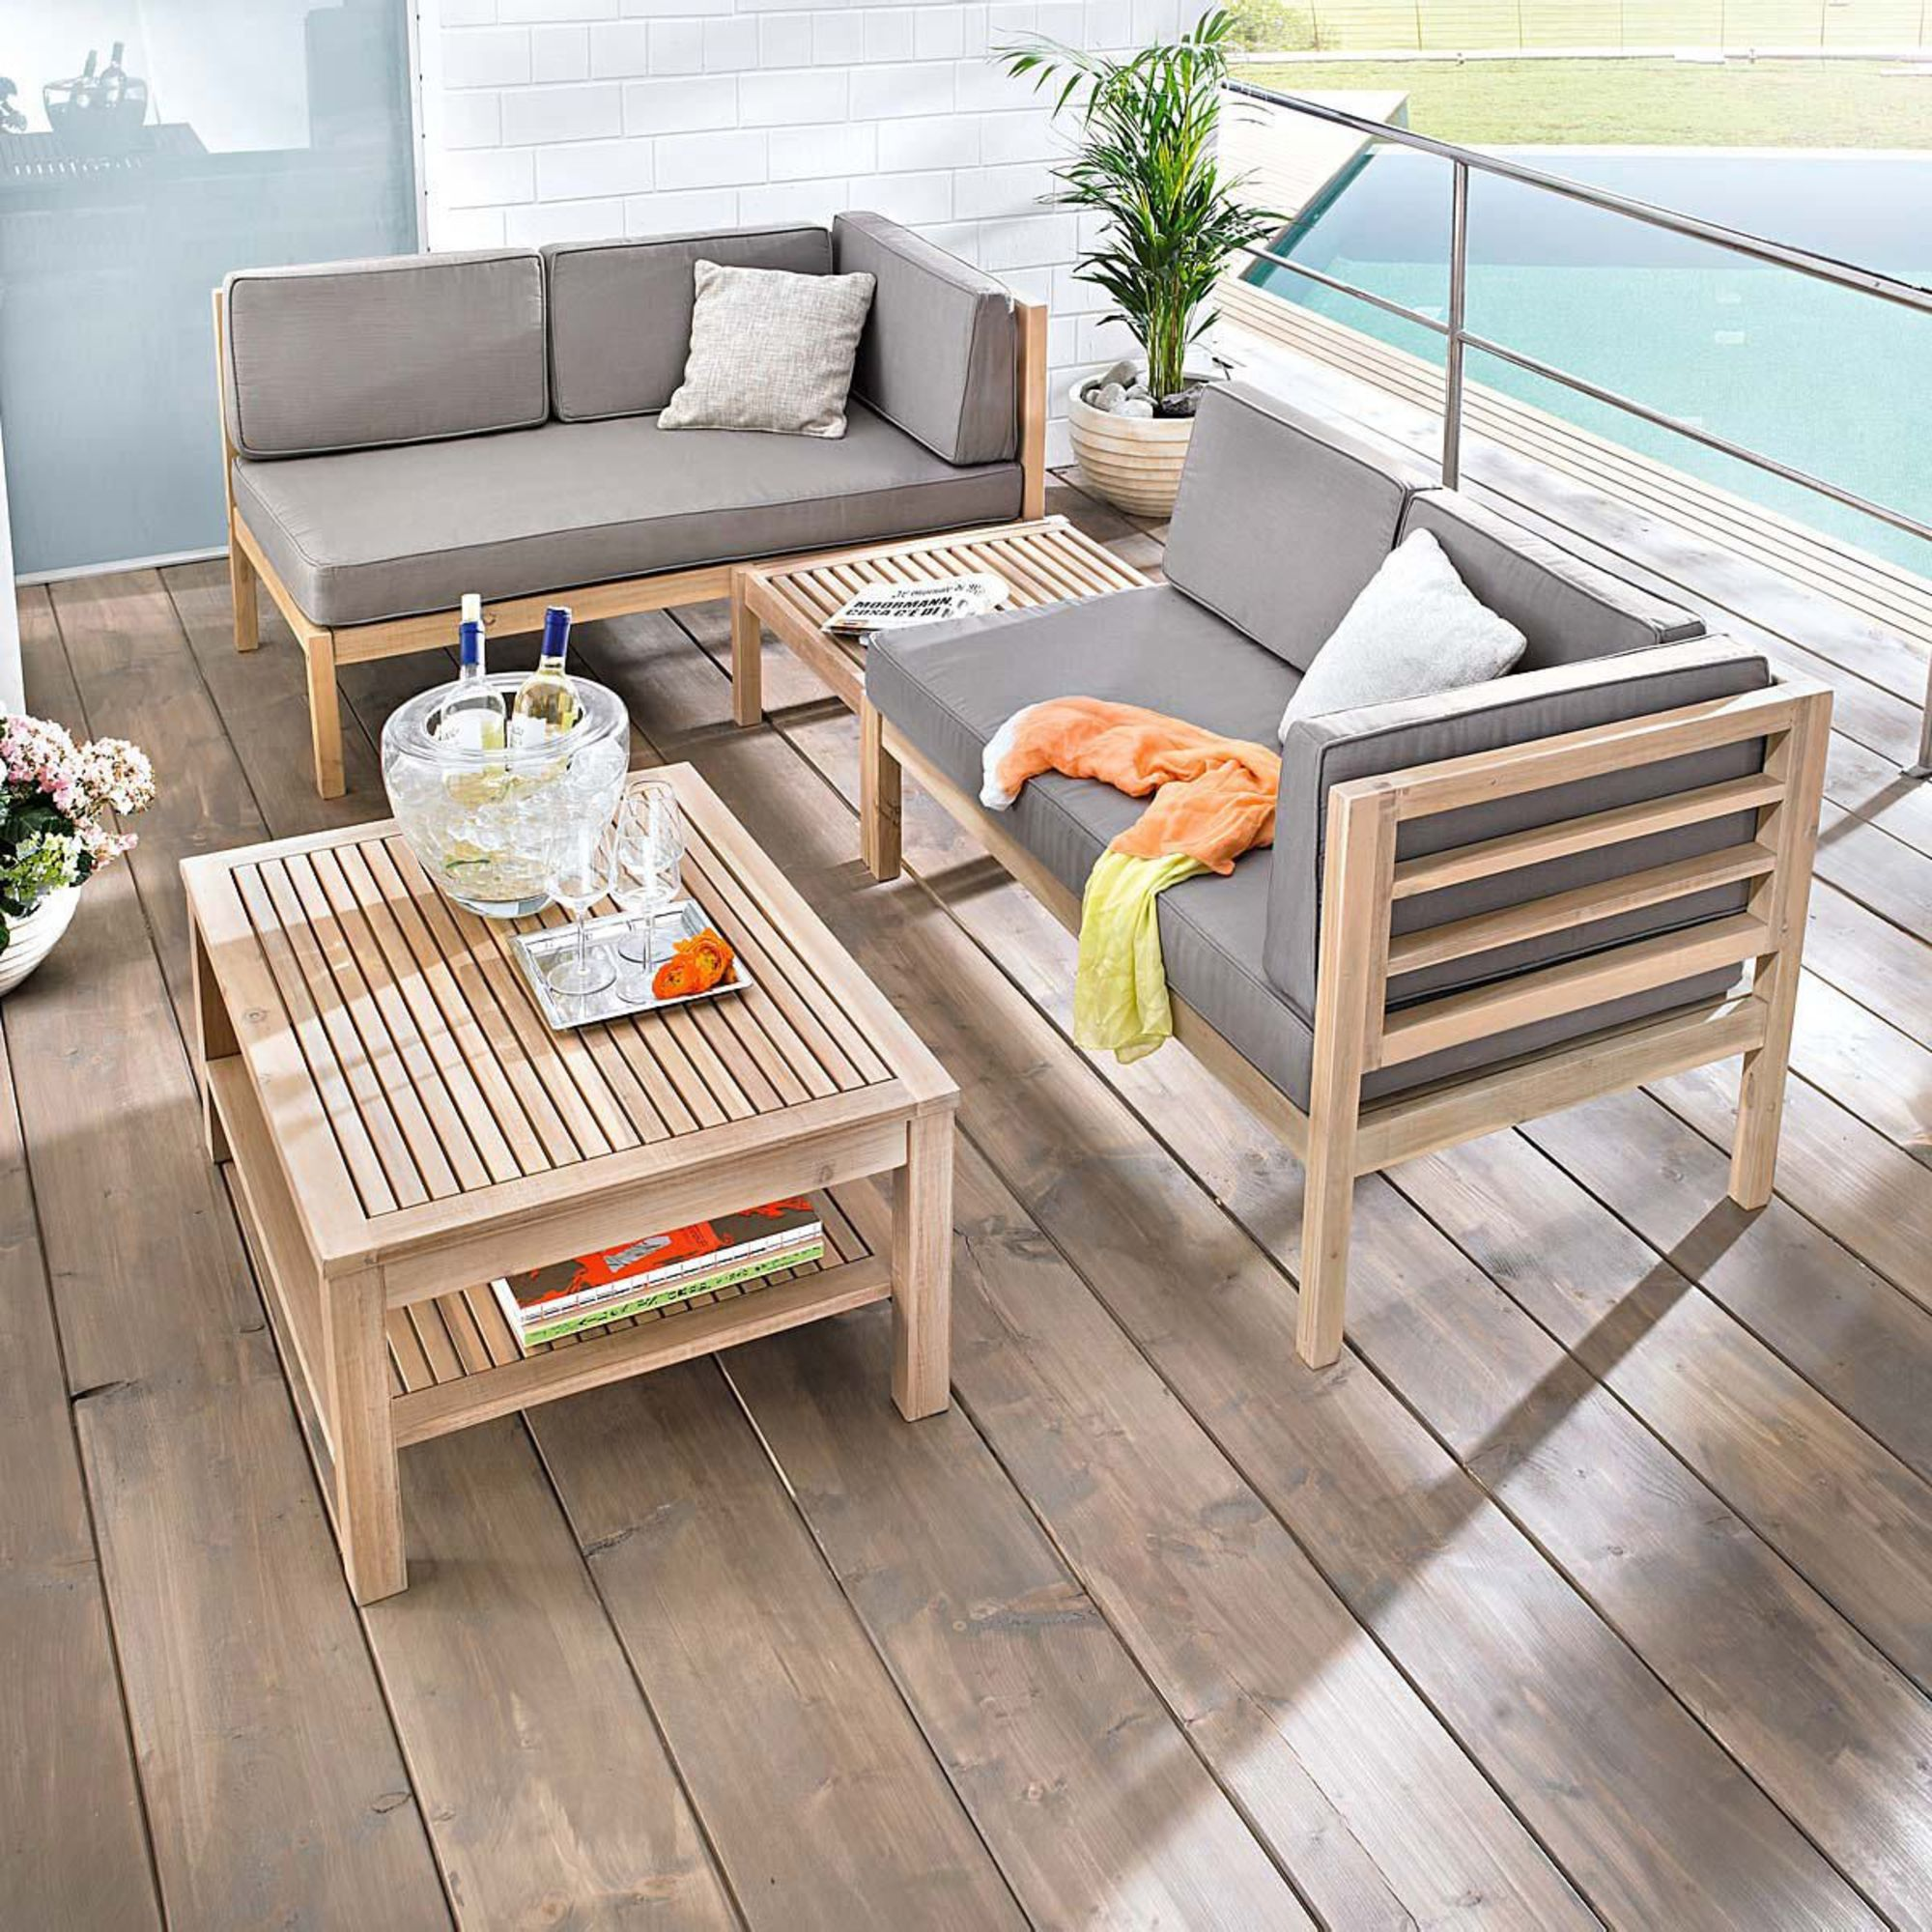 gartenmobel set lounge holz – motelindio, Gartenarbeit ideen